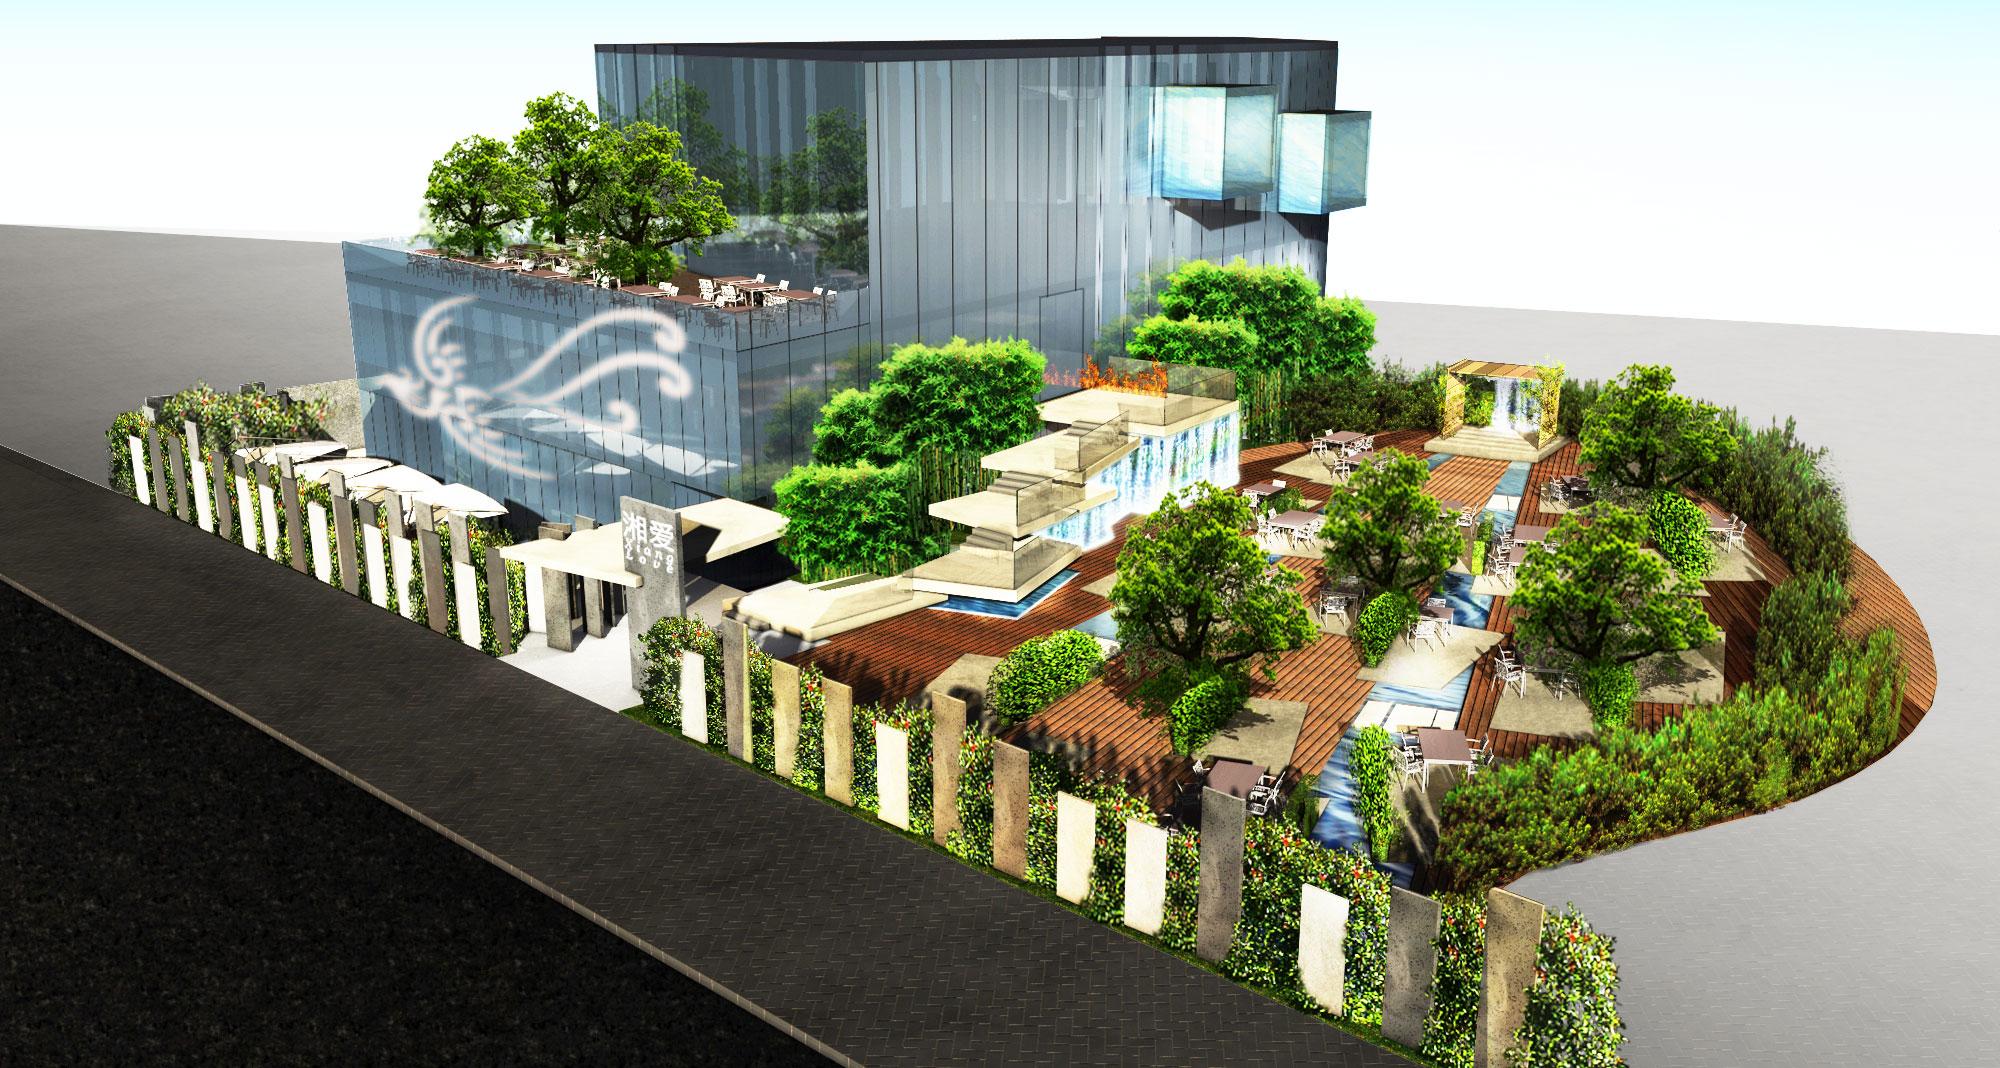 restaurant in beijing prc uainot. Black Bedroom Furniture Sets. Home Design Ideas